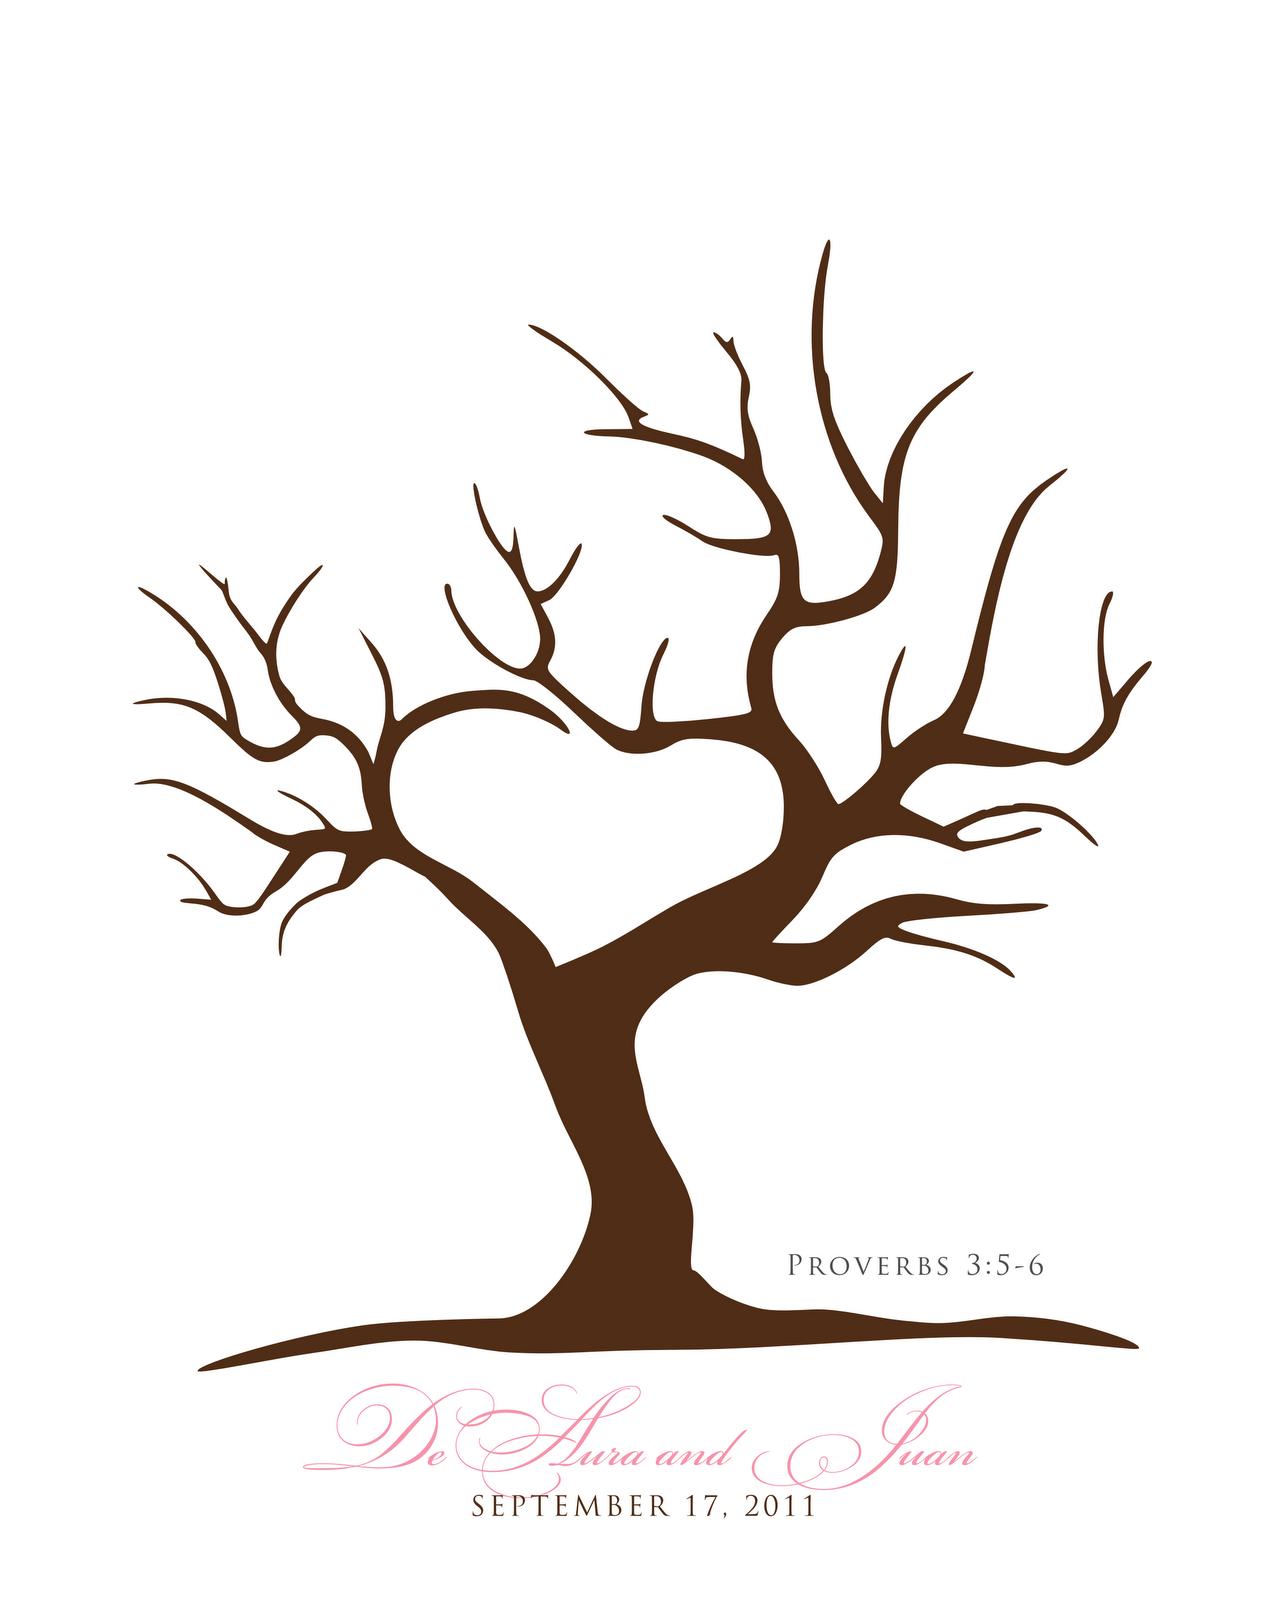 Free Printable Fingerprint Tree Template | Embroidery | Wedding - Free Printable Tree Template